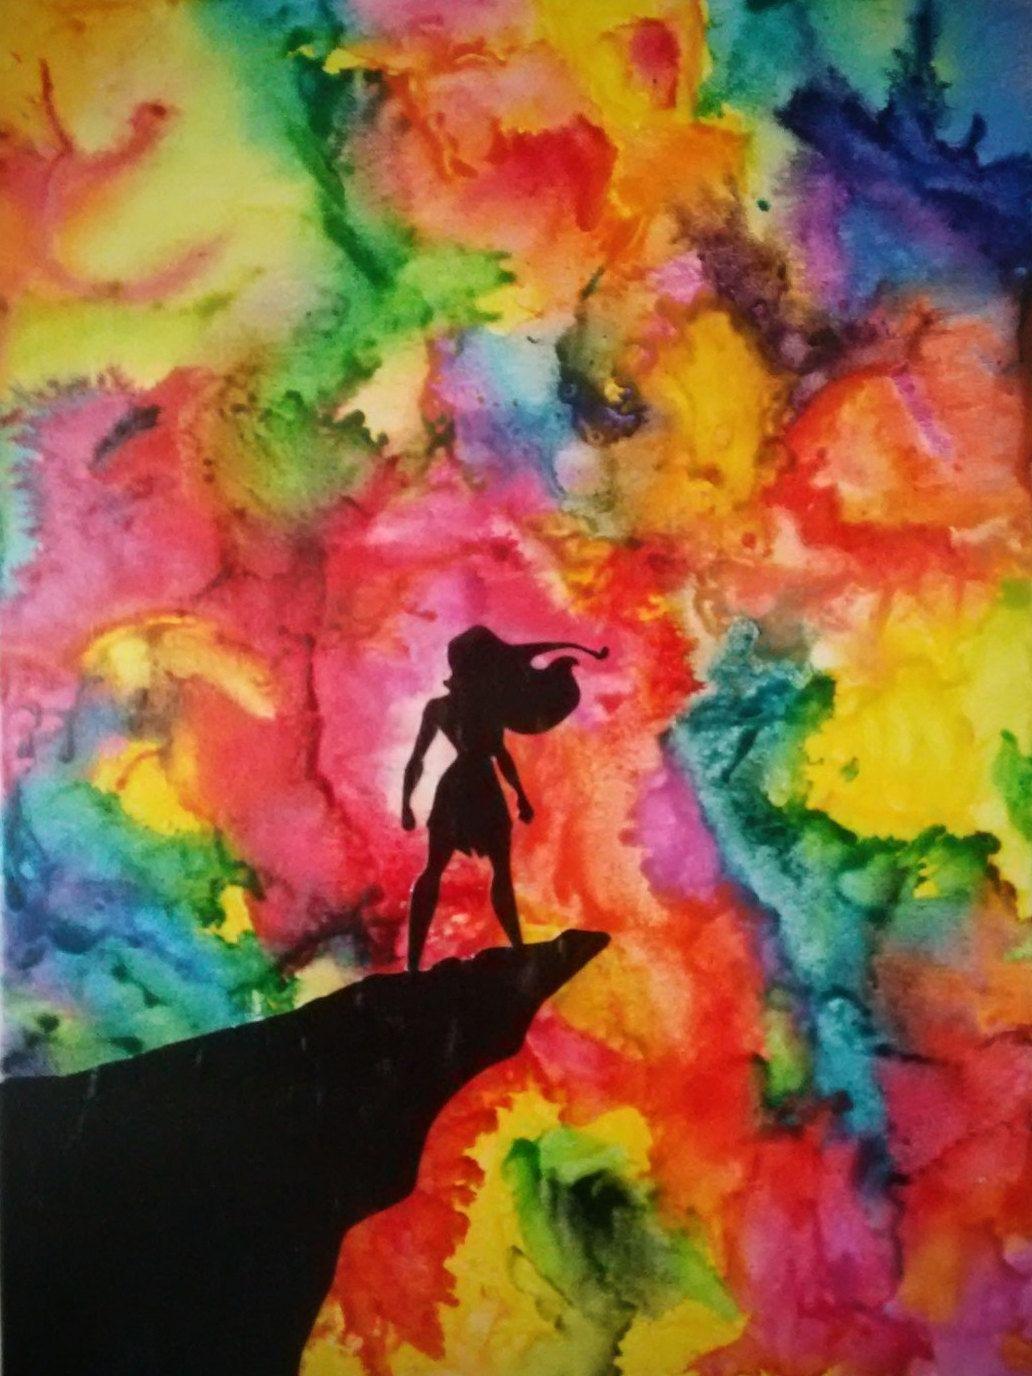 disney crayon art pocahontas silhouette - melted crayon art - wall art - watercolor art